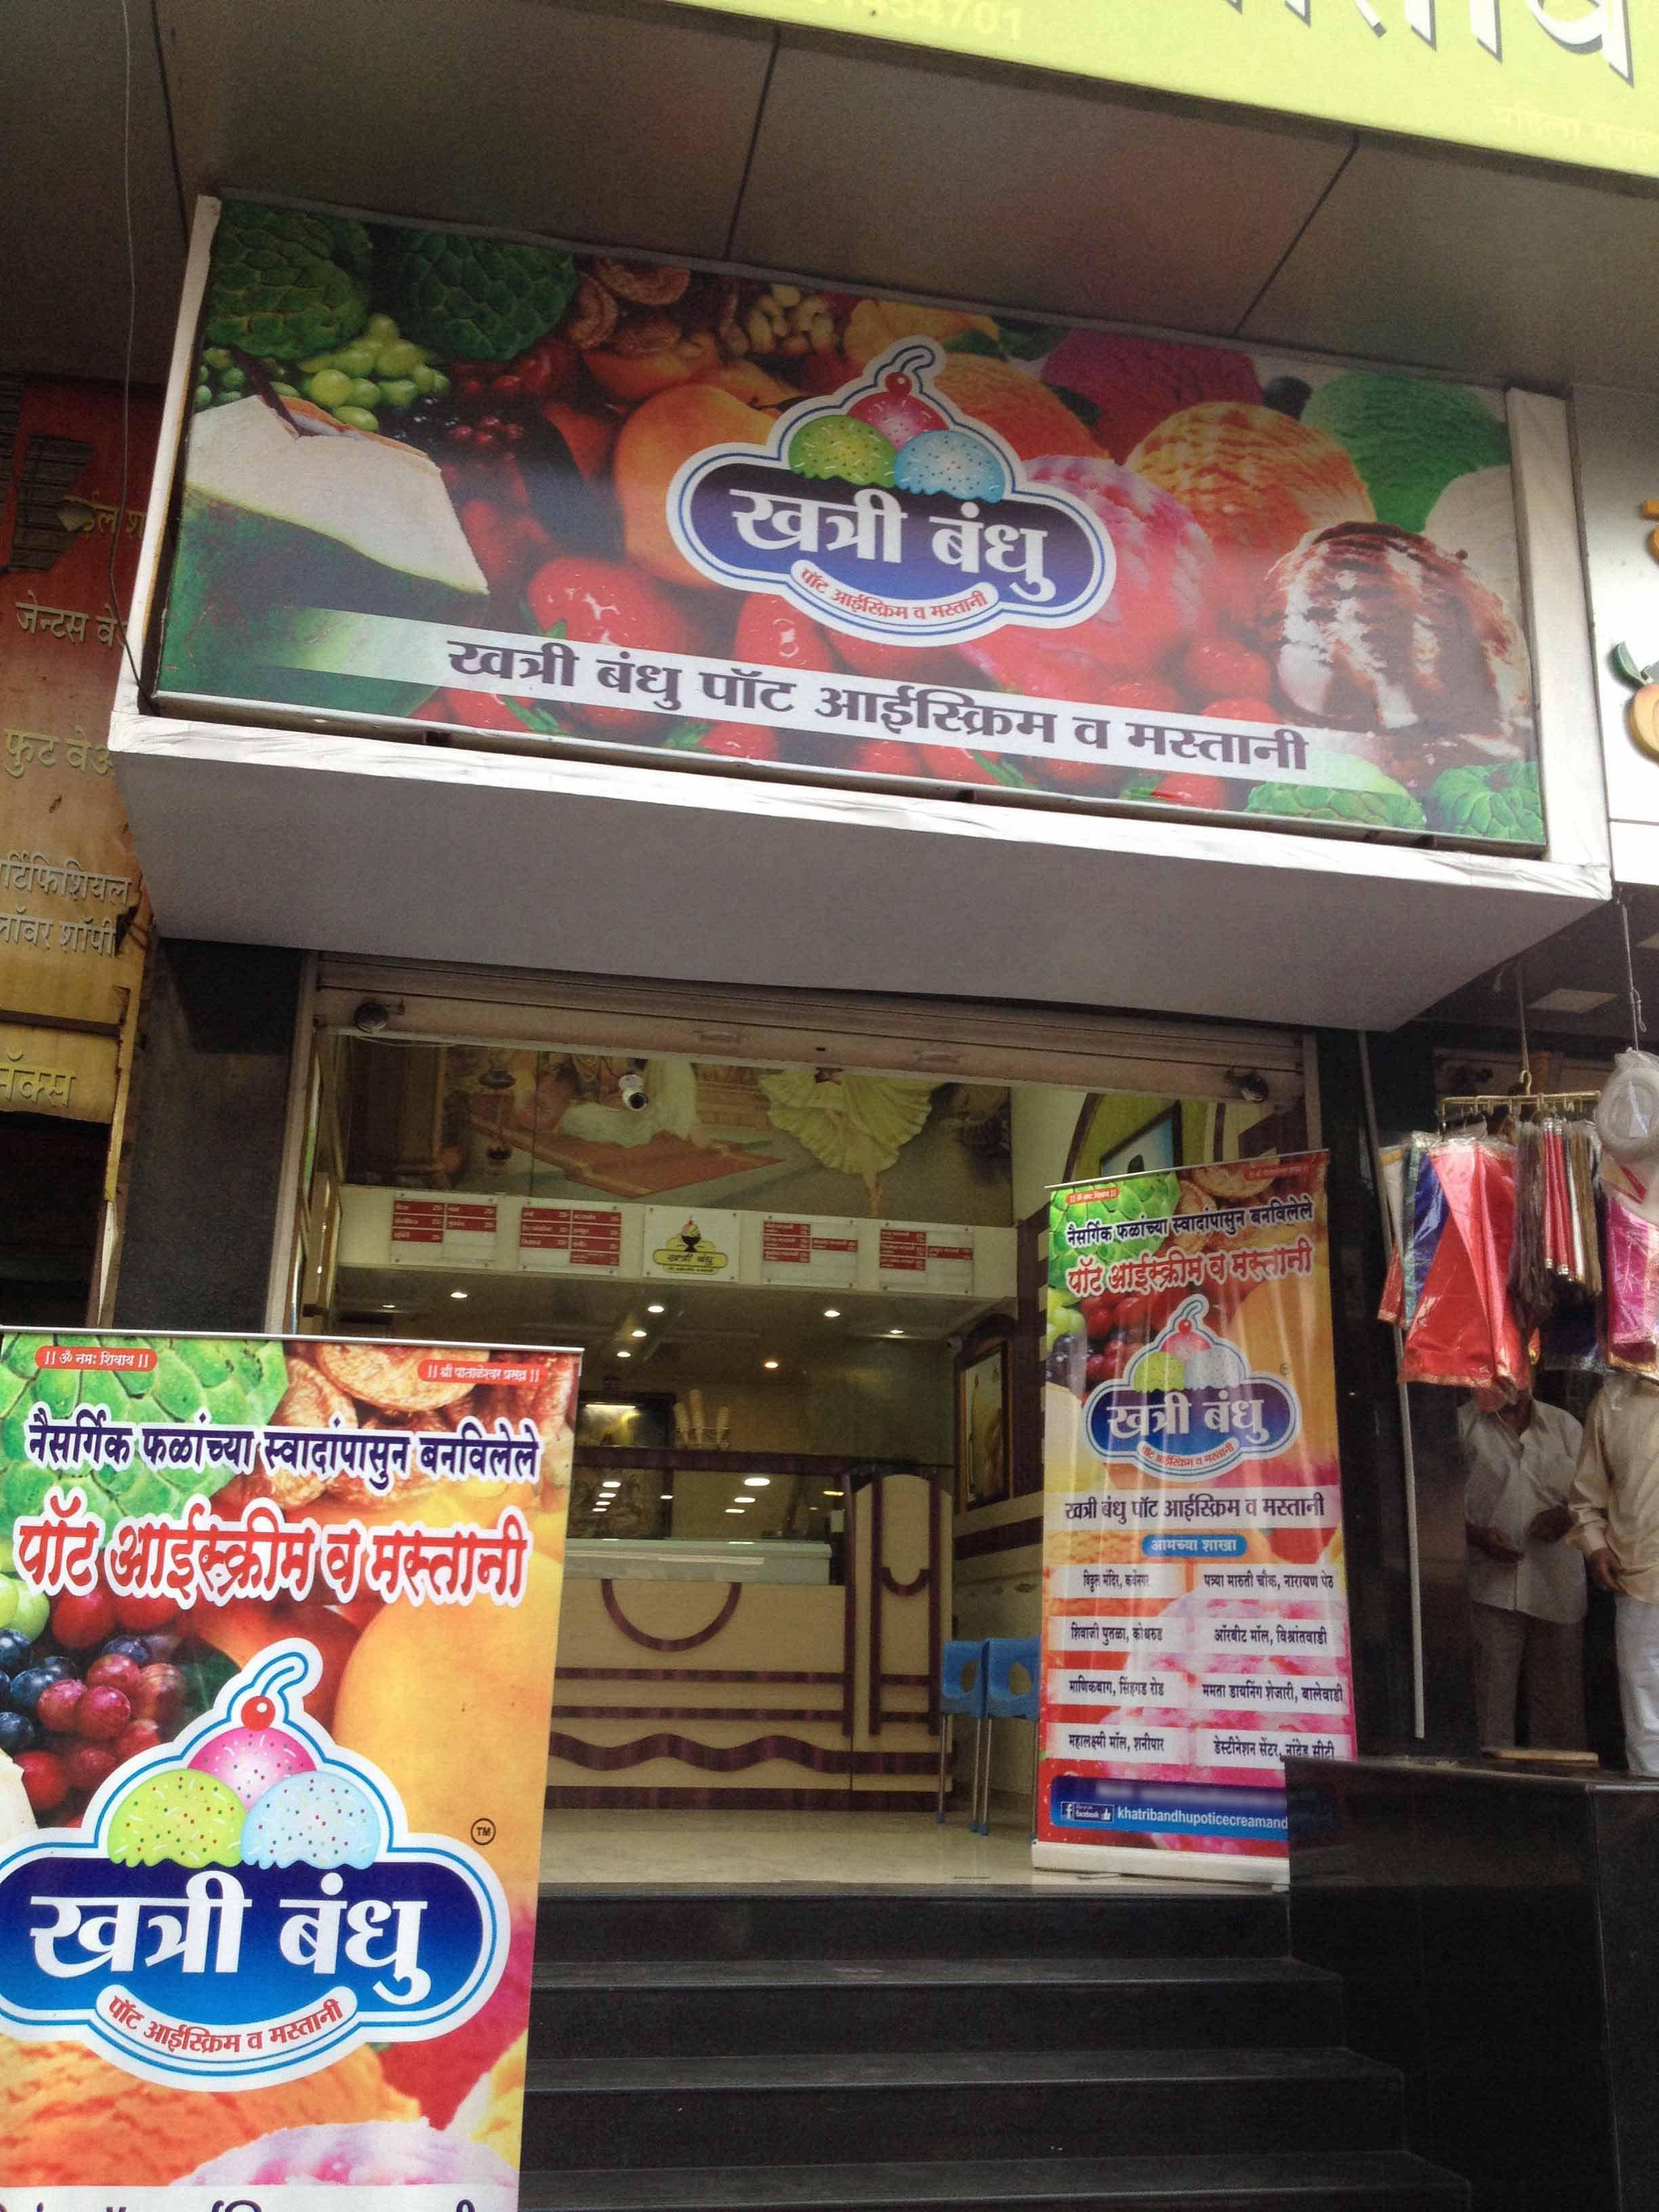 Khatri Bandhu Pot Ice Cream - Narayan Peth - Pune Image